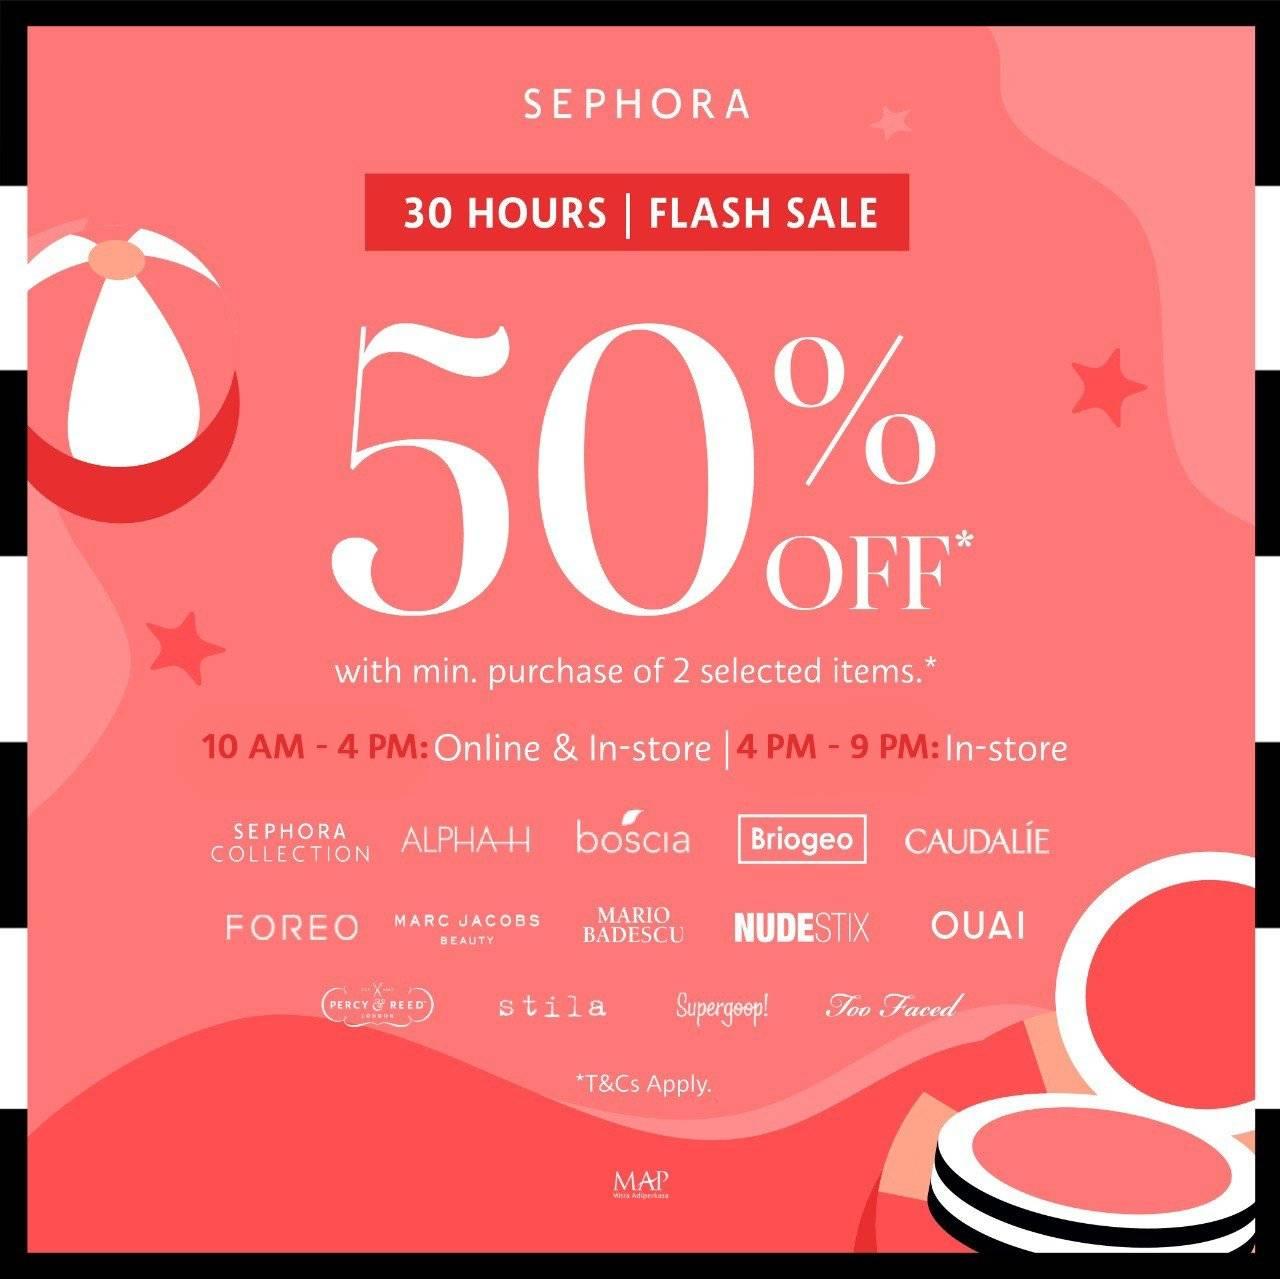 Diskon Sephora Promo 30 Hours Flash Sale Diskon s/d 50%